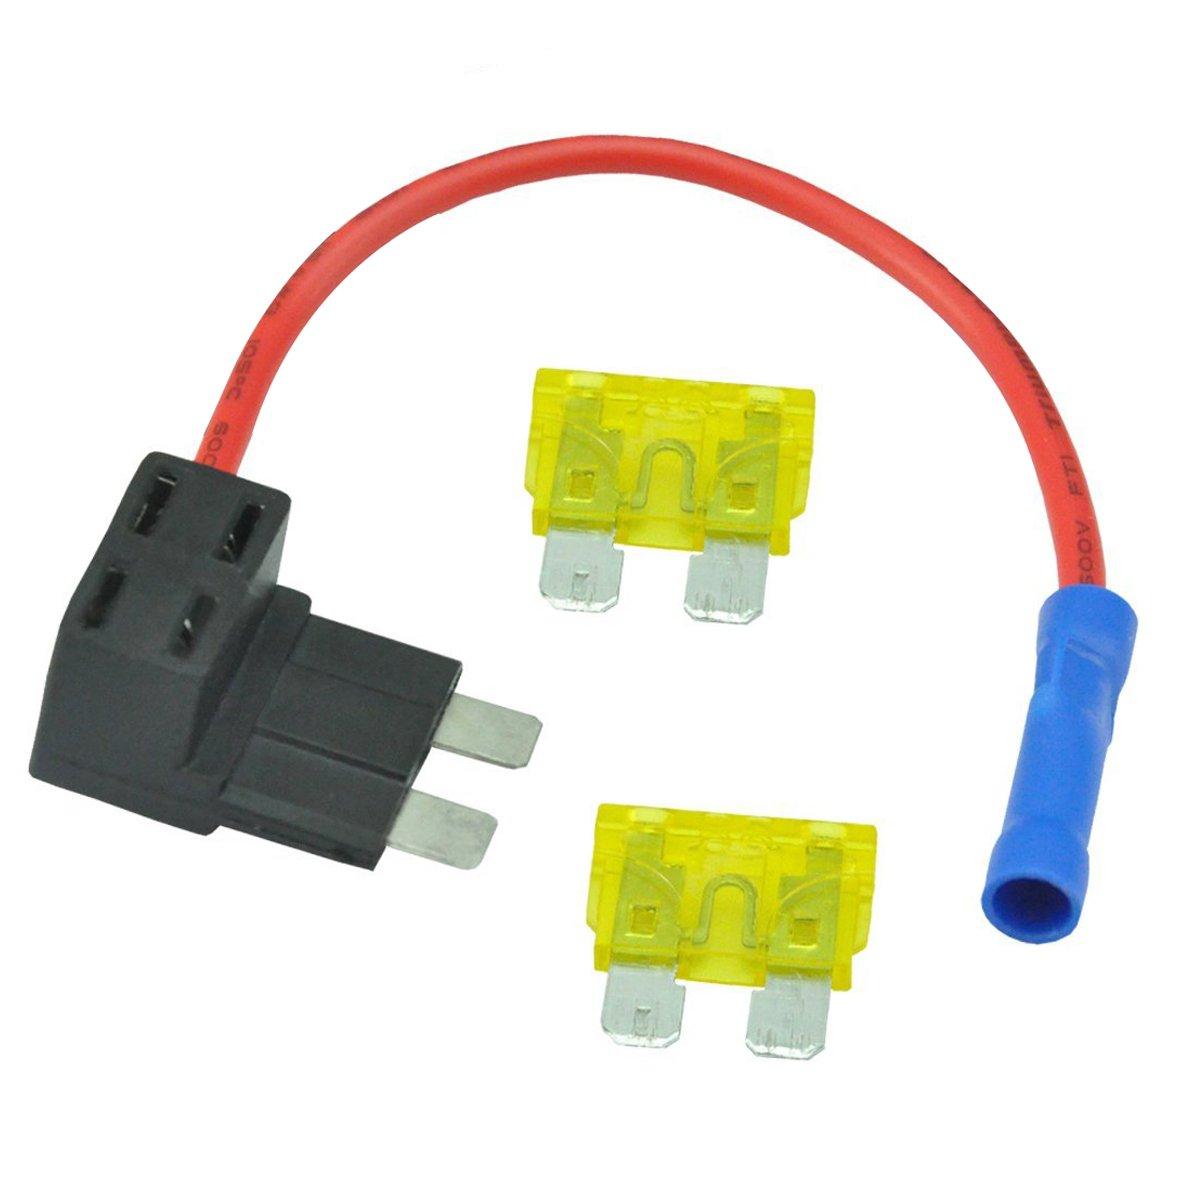 autoec ato atc 21amp add a circuit fuse holder fuse box tap kit Fuse Box Clip Art